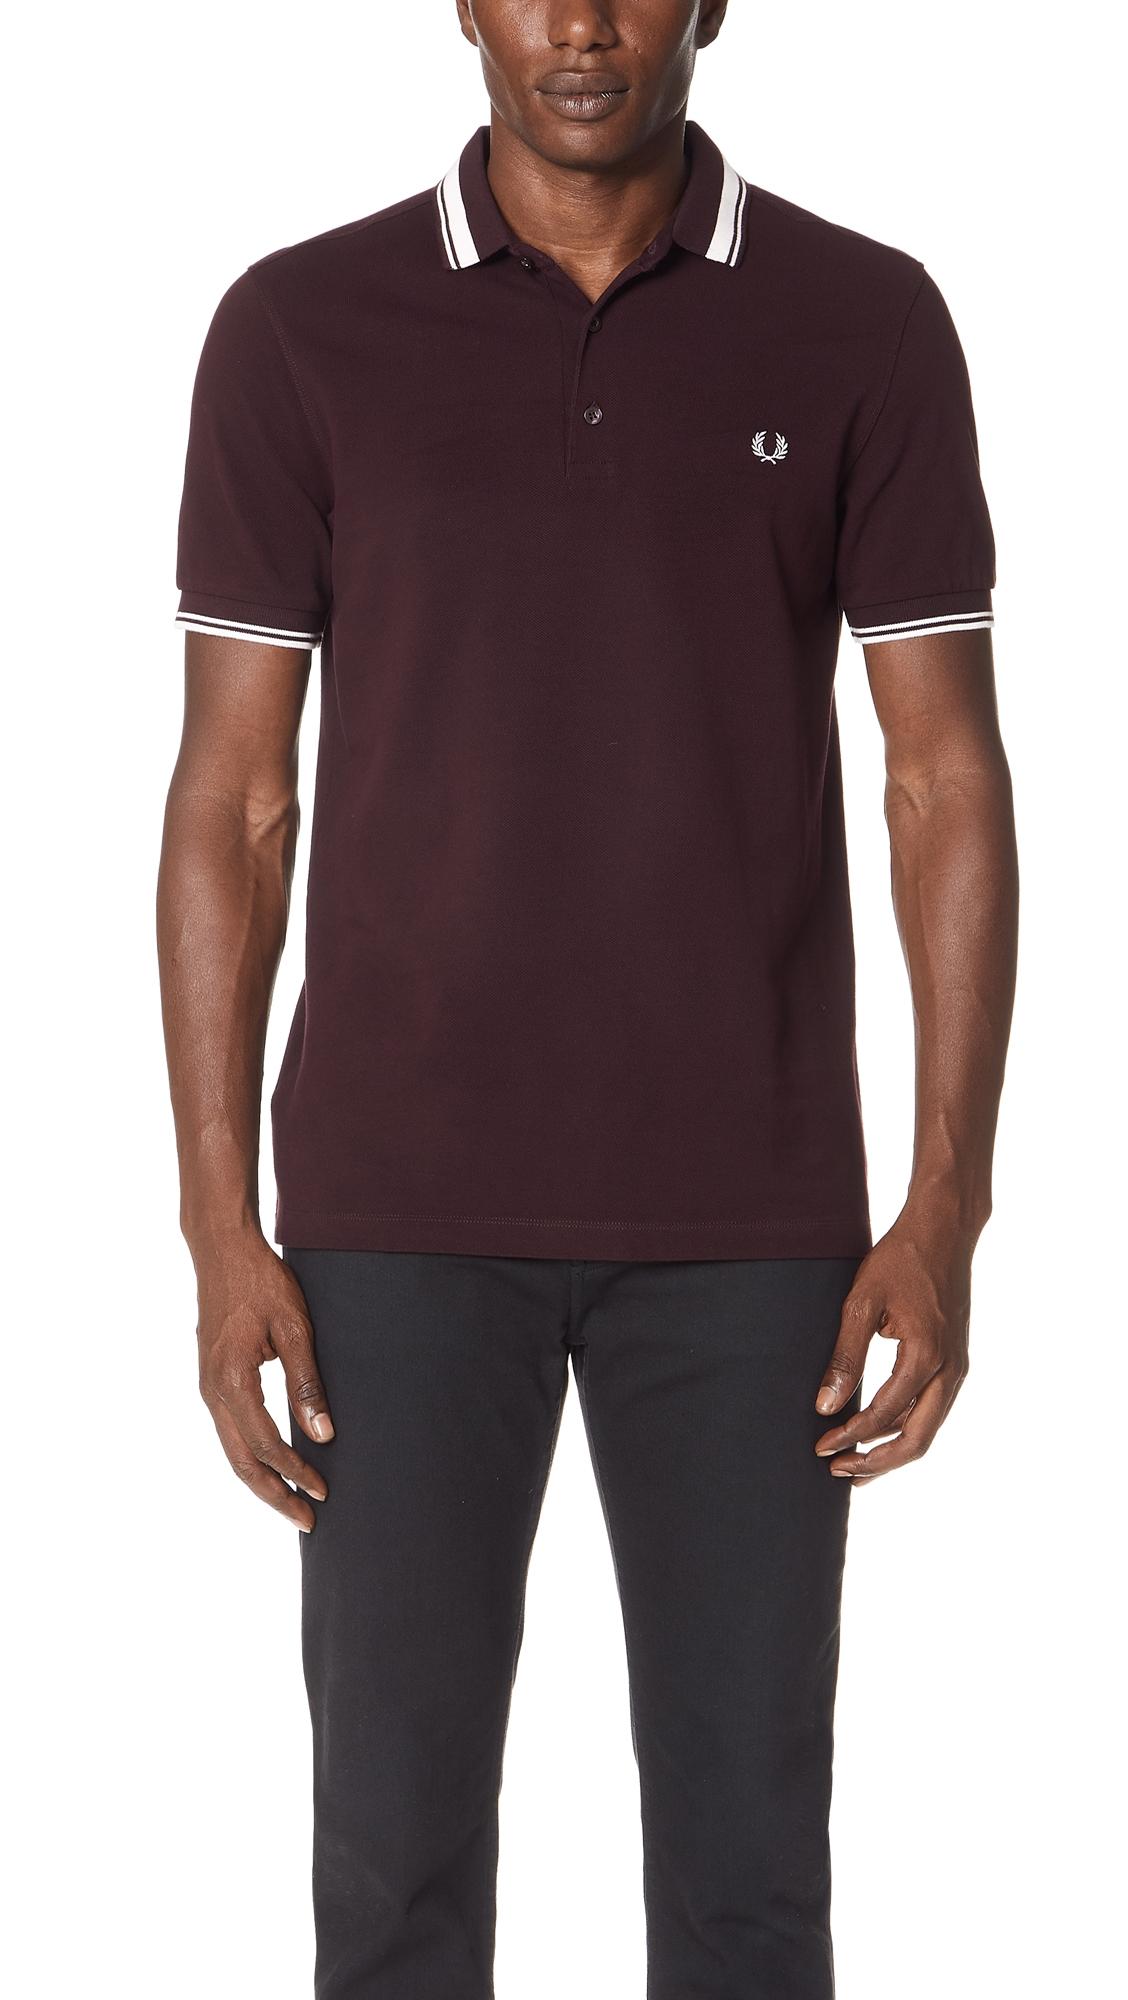 9d81c152e9 Contrast Tipped Polo Shirt, Deep Mahogany